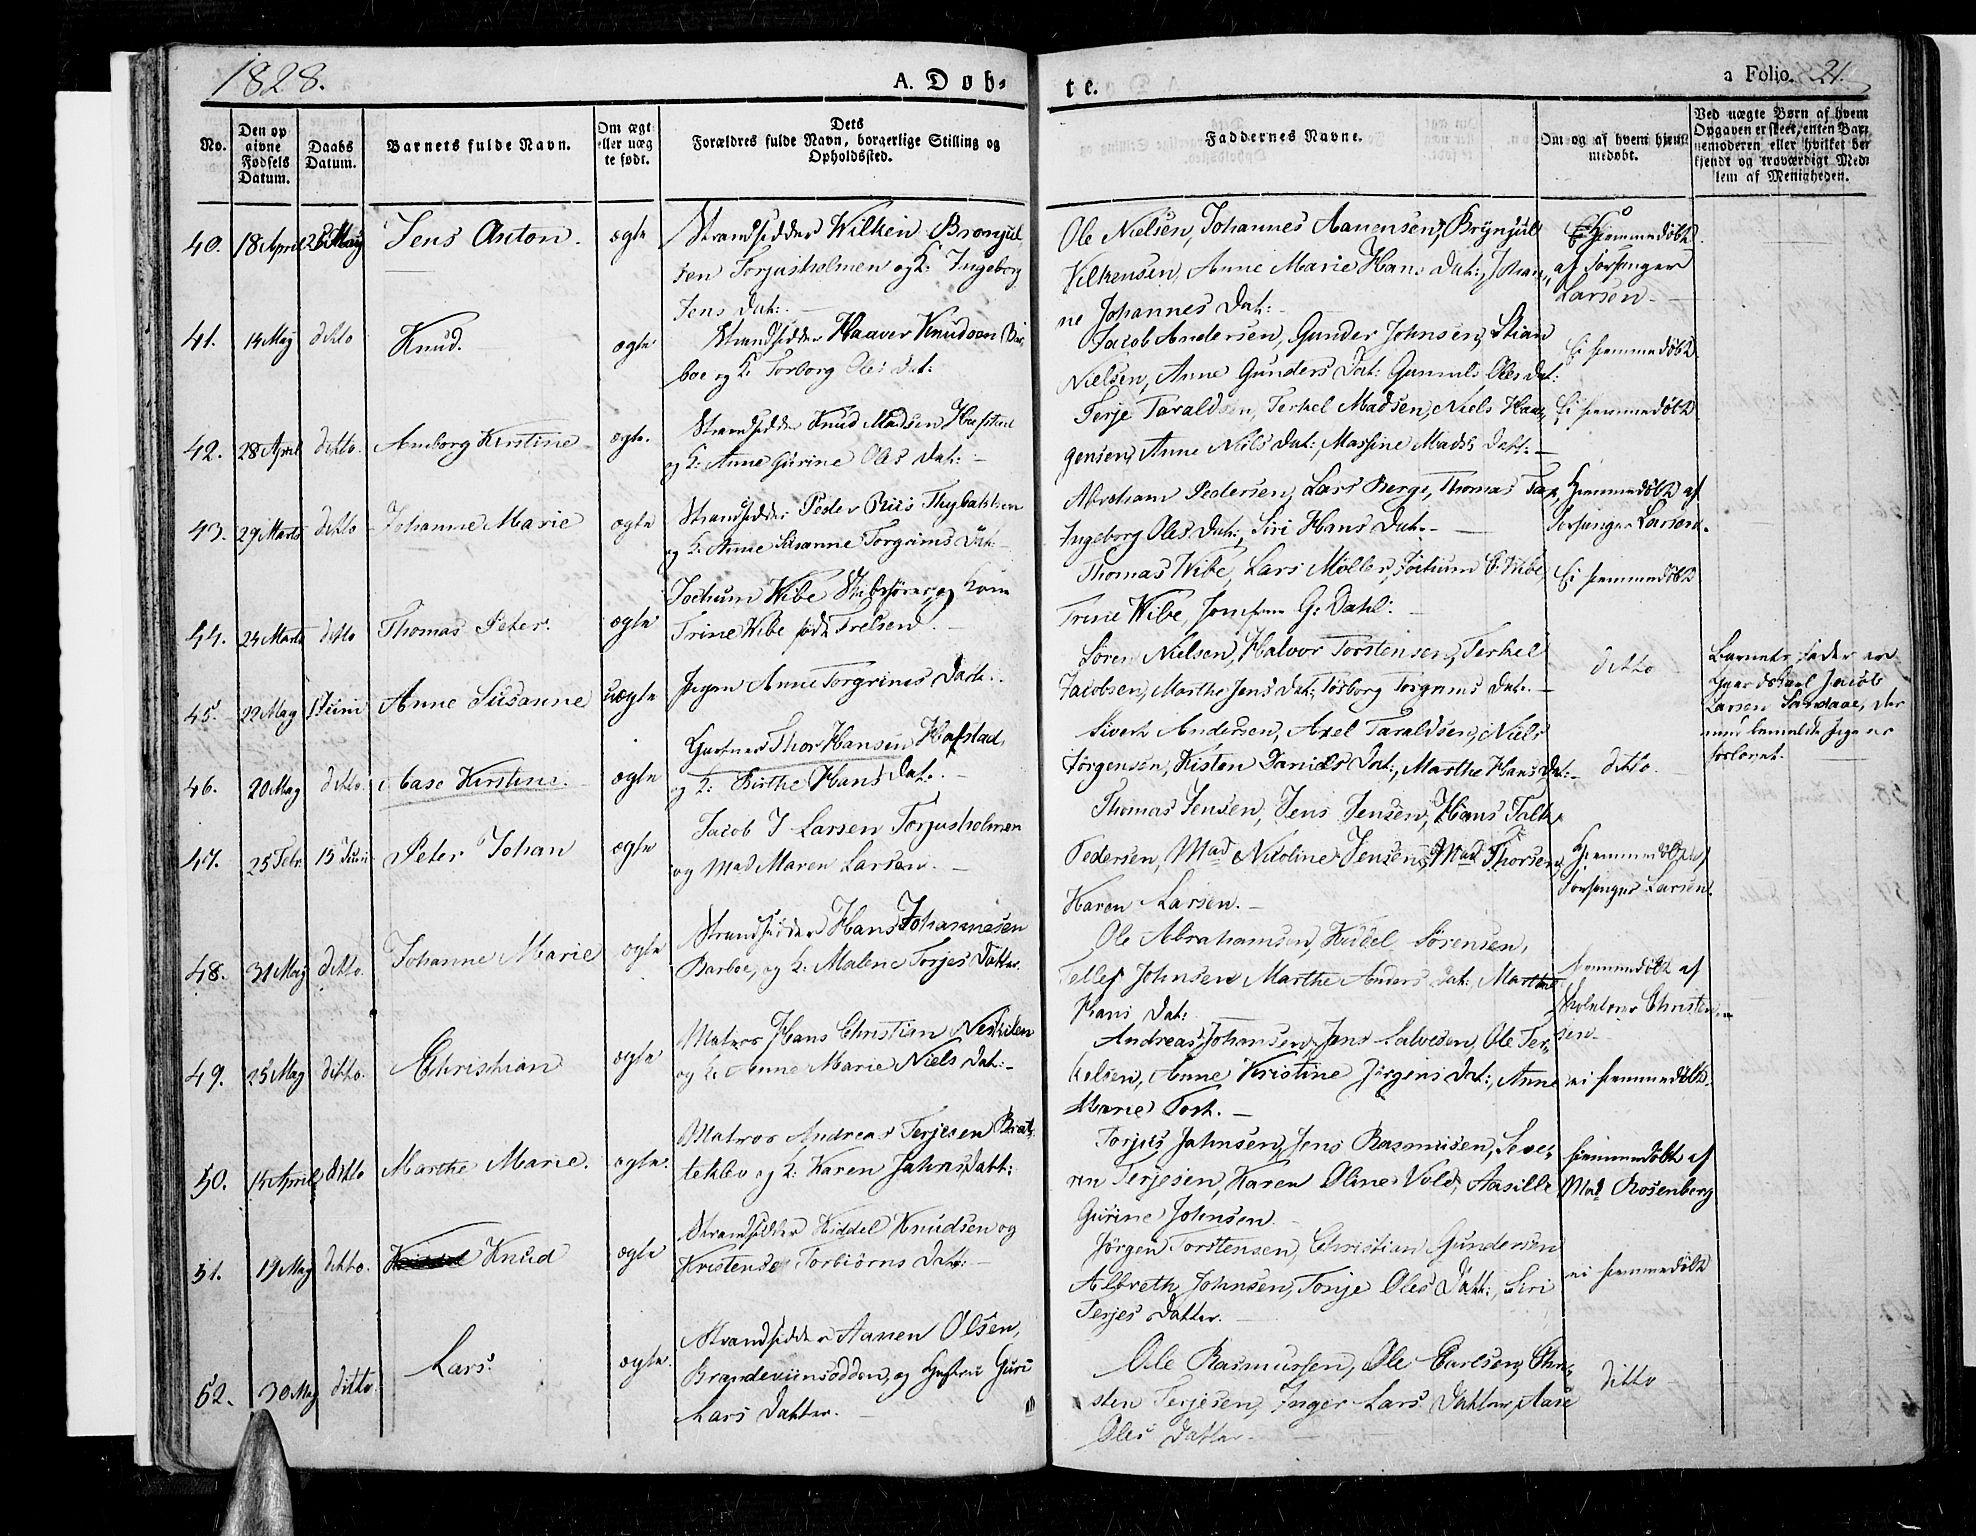 SAK, Tromøy sokneprestkontor, F/Fa/L0003: Ministerialbok nr. A 3, 1825-1837, s. 21